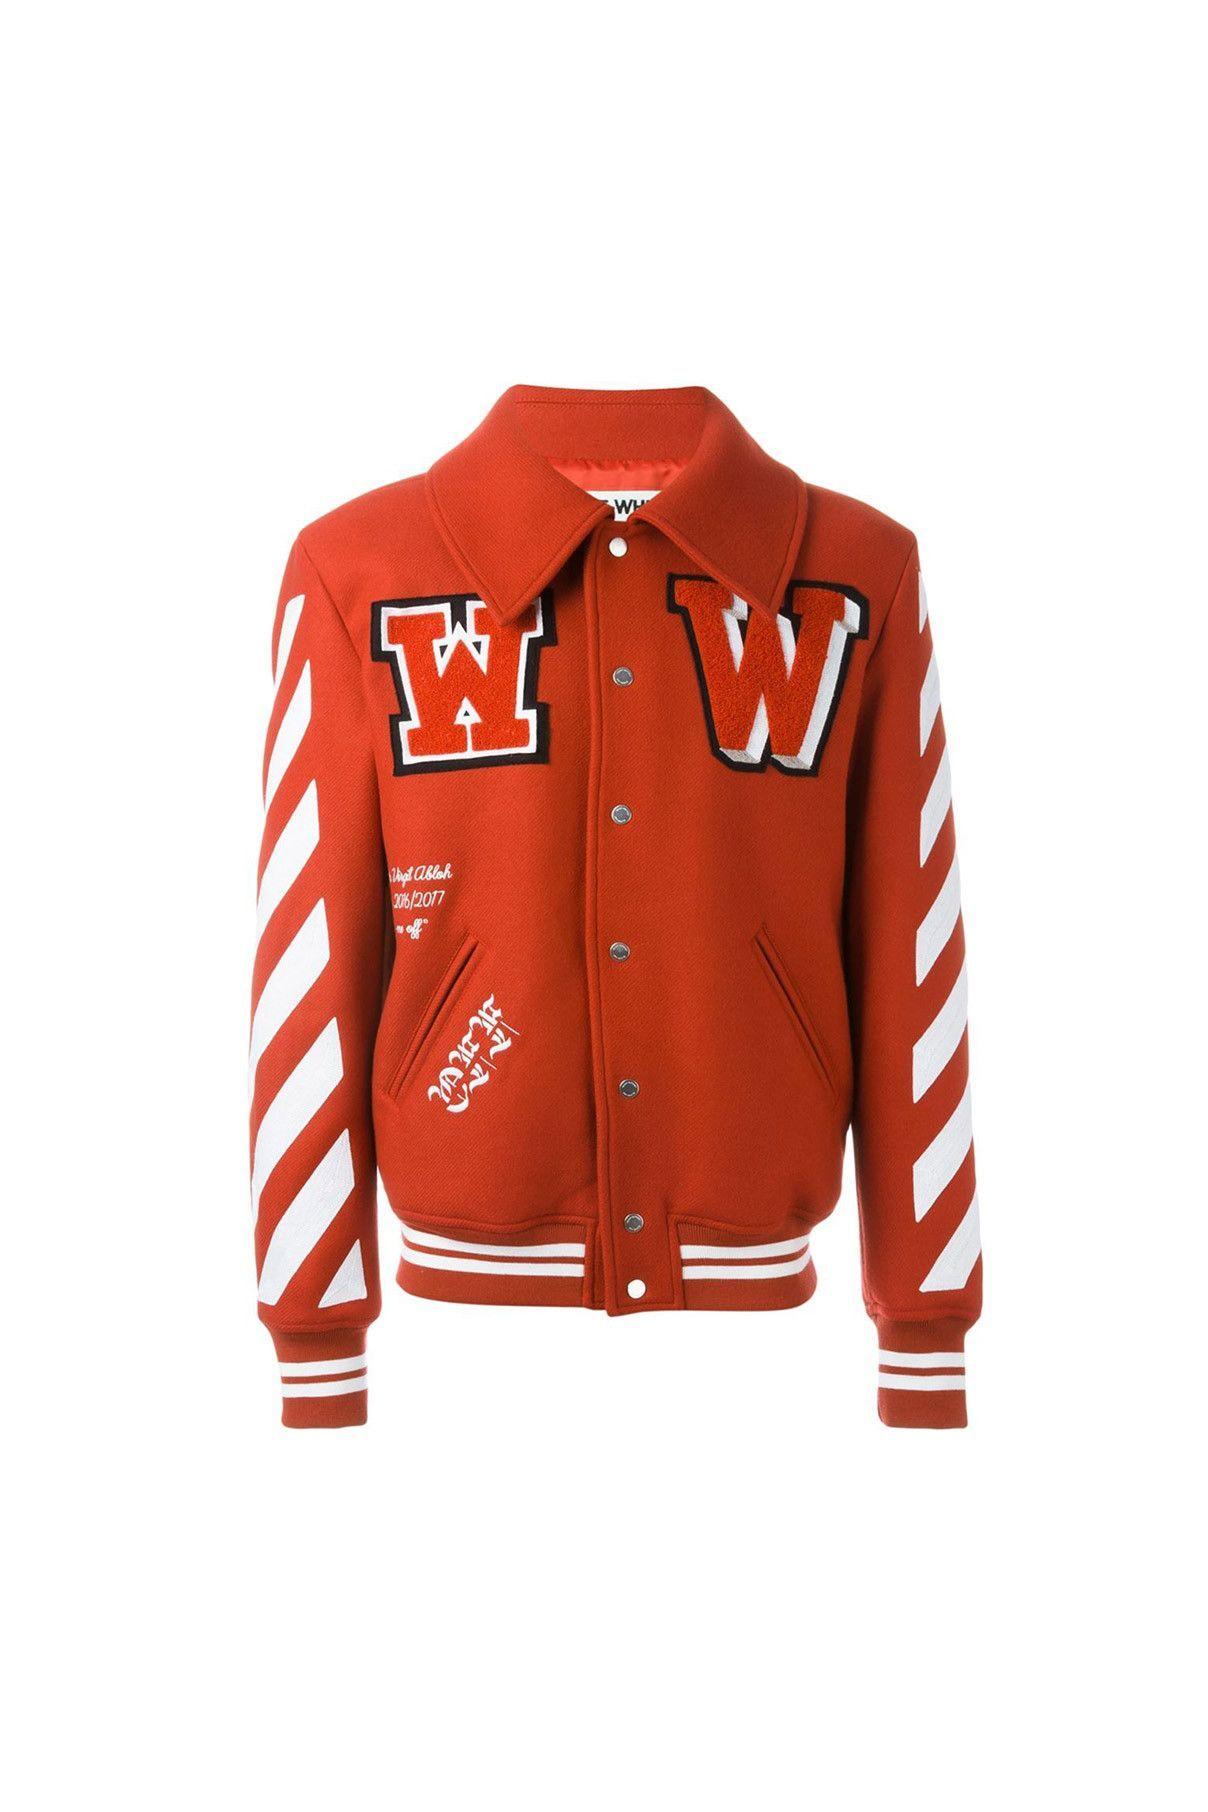 Off White 01 Clothing 07 Outerwear 01 Jacket 03 Varsity Patched Letterman Jacket Off White Varsity Jacket Varsity Jacket Mens Jackets [ 1812 x 1208 Pixel ]